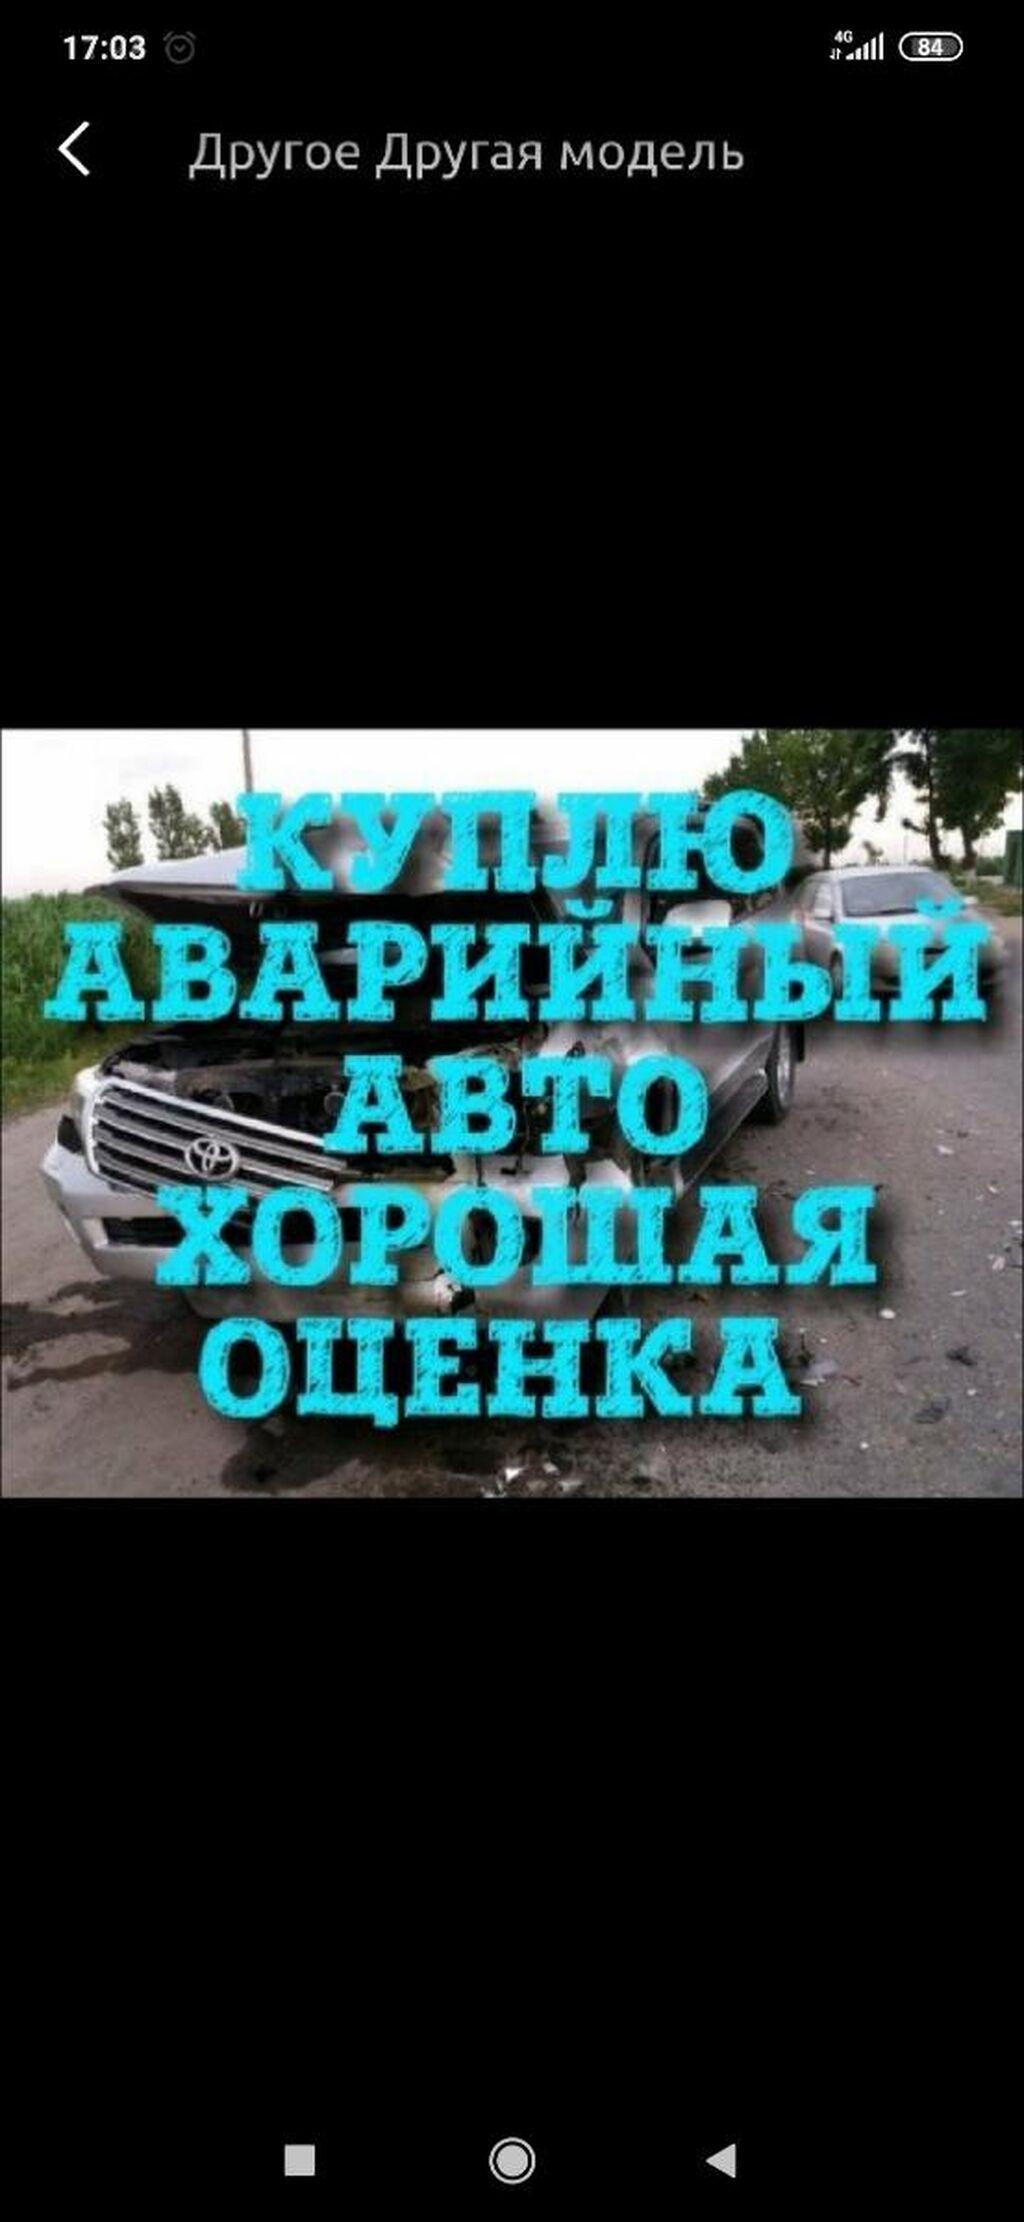 Аварийный Аварийный аварийном скупка Урулган Аварийный машина алабыз скупка авто